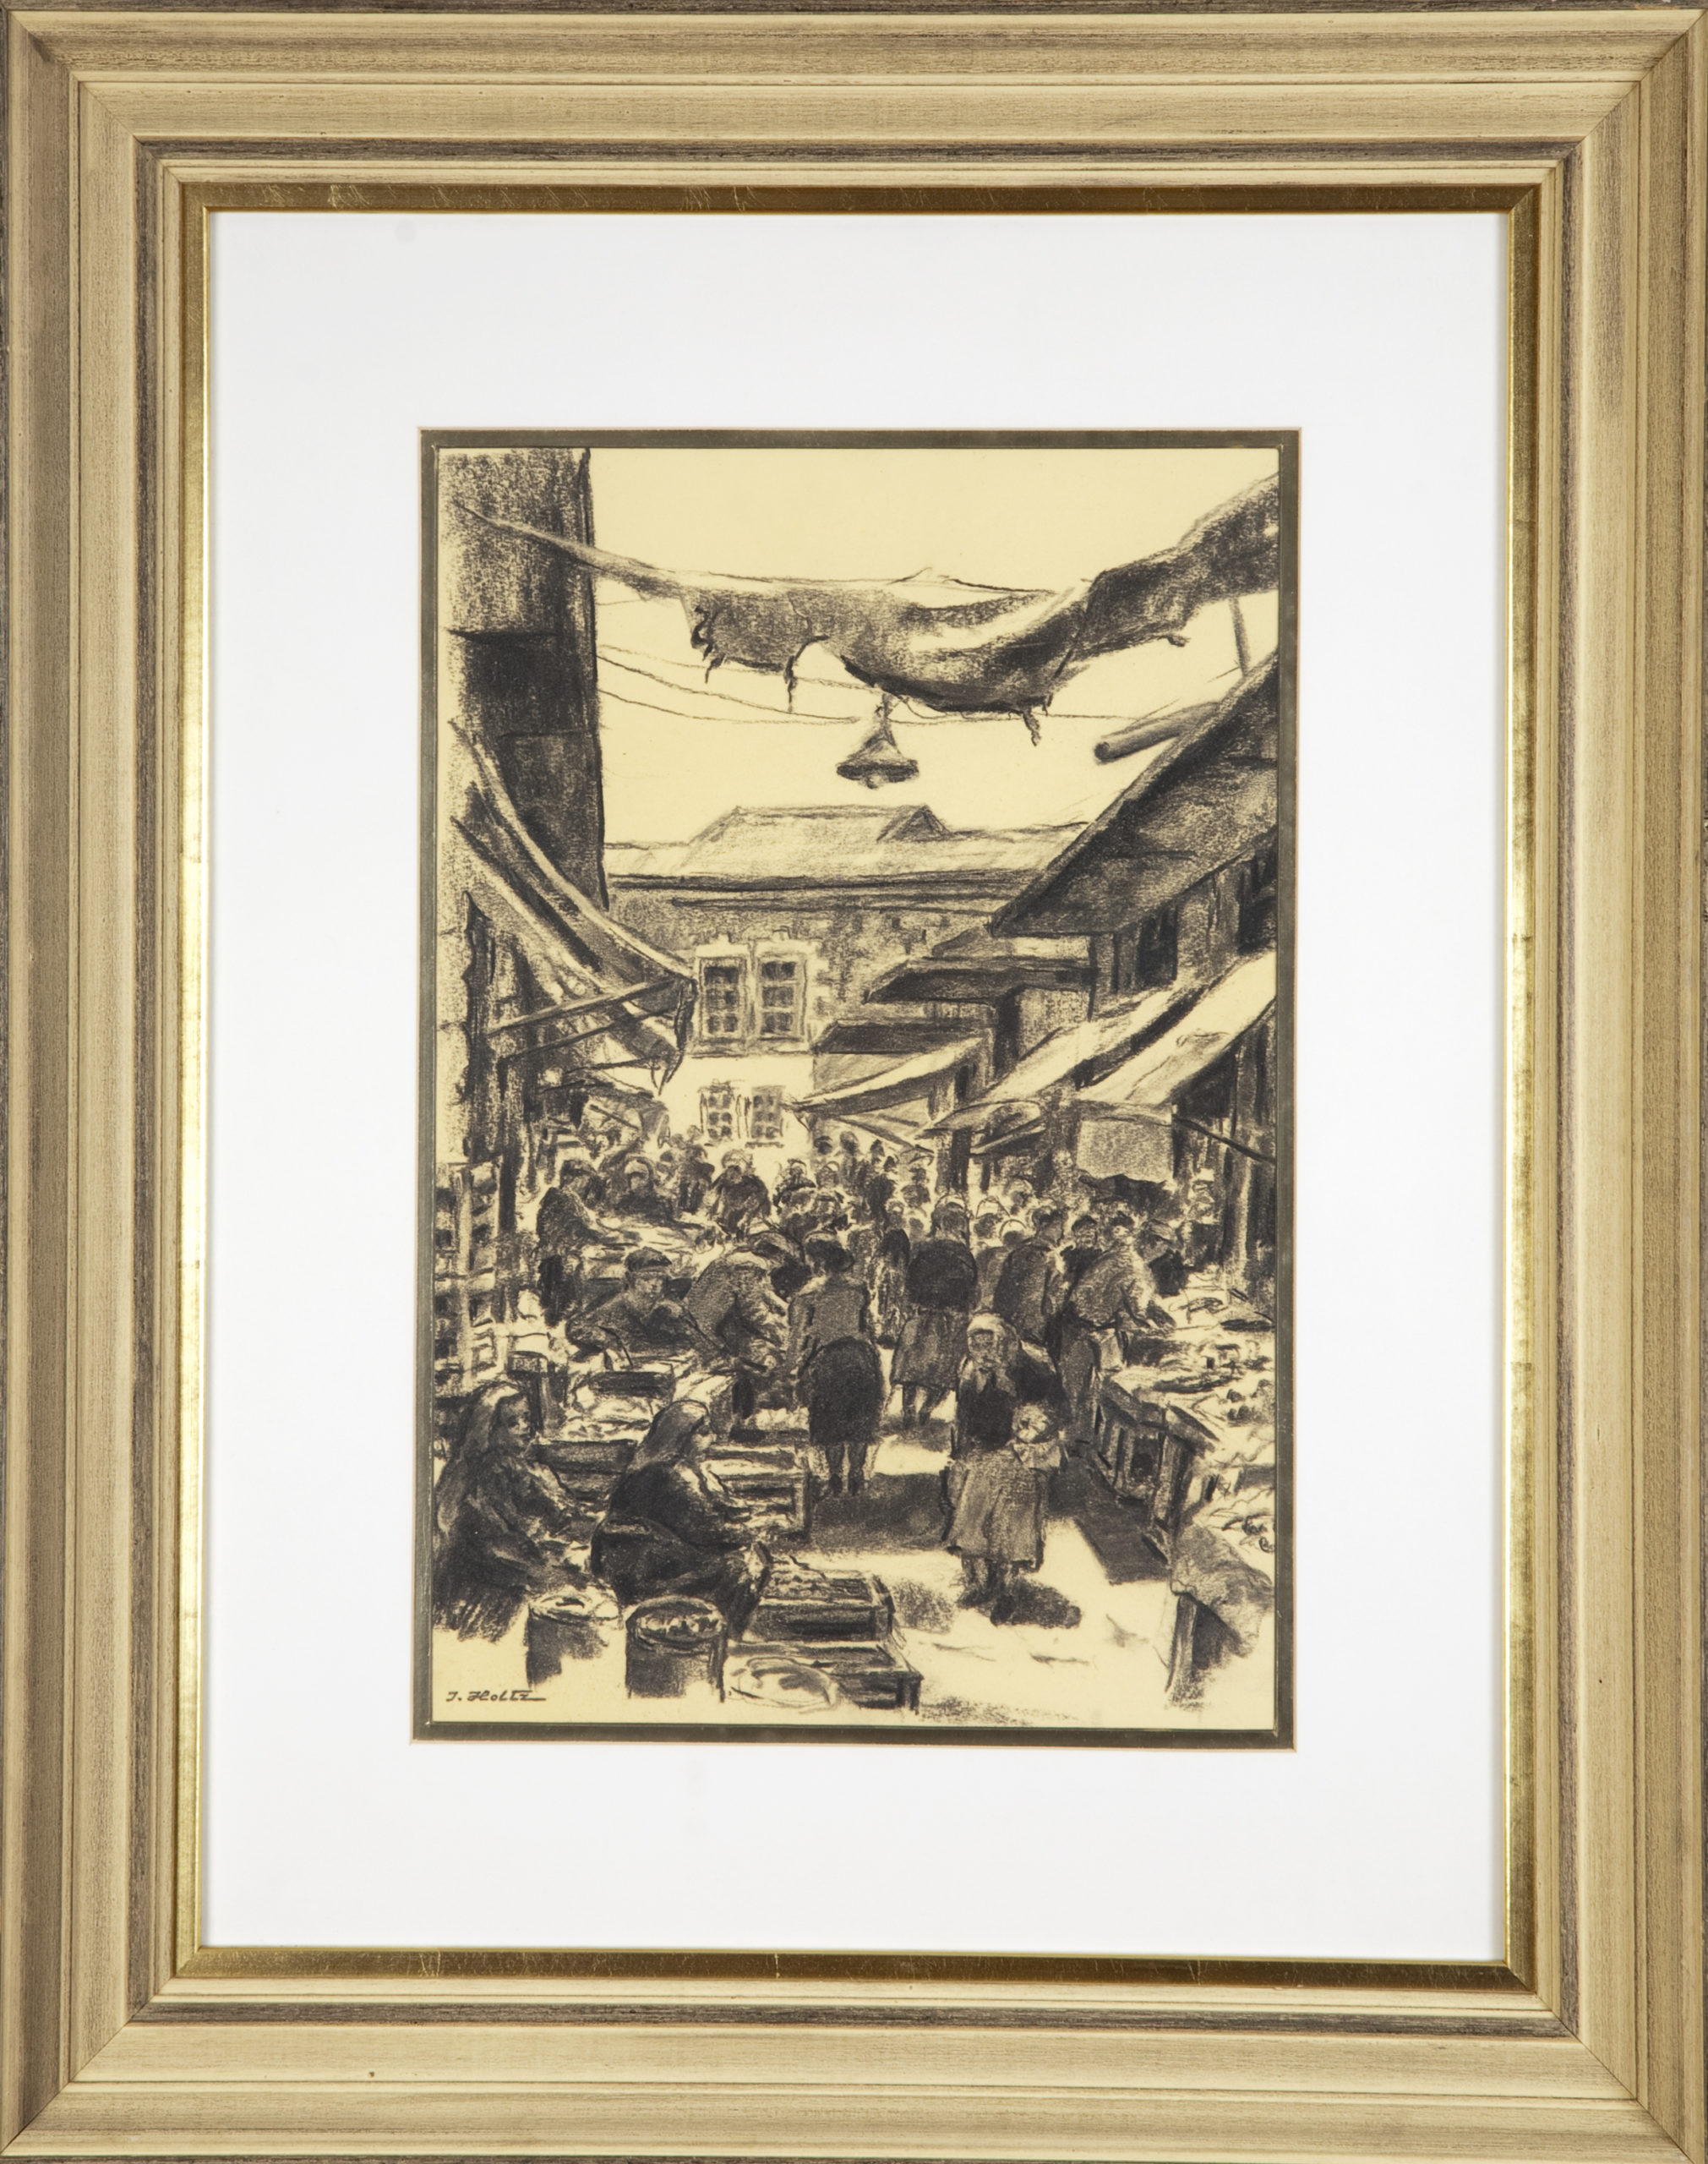 249 Market in Jerusalem 2 1960 - Charcoal - 12 x 18 - Frame: 23.25 x 29.5 x 2.25